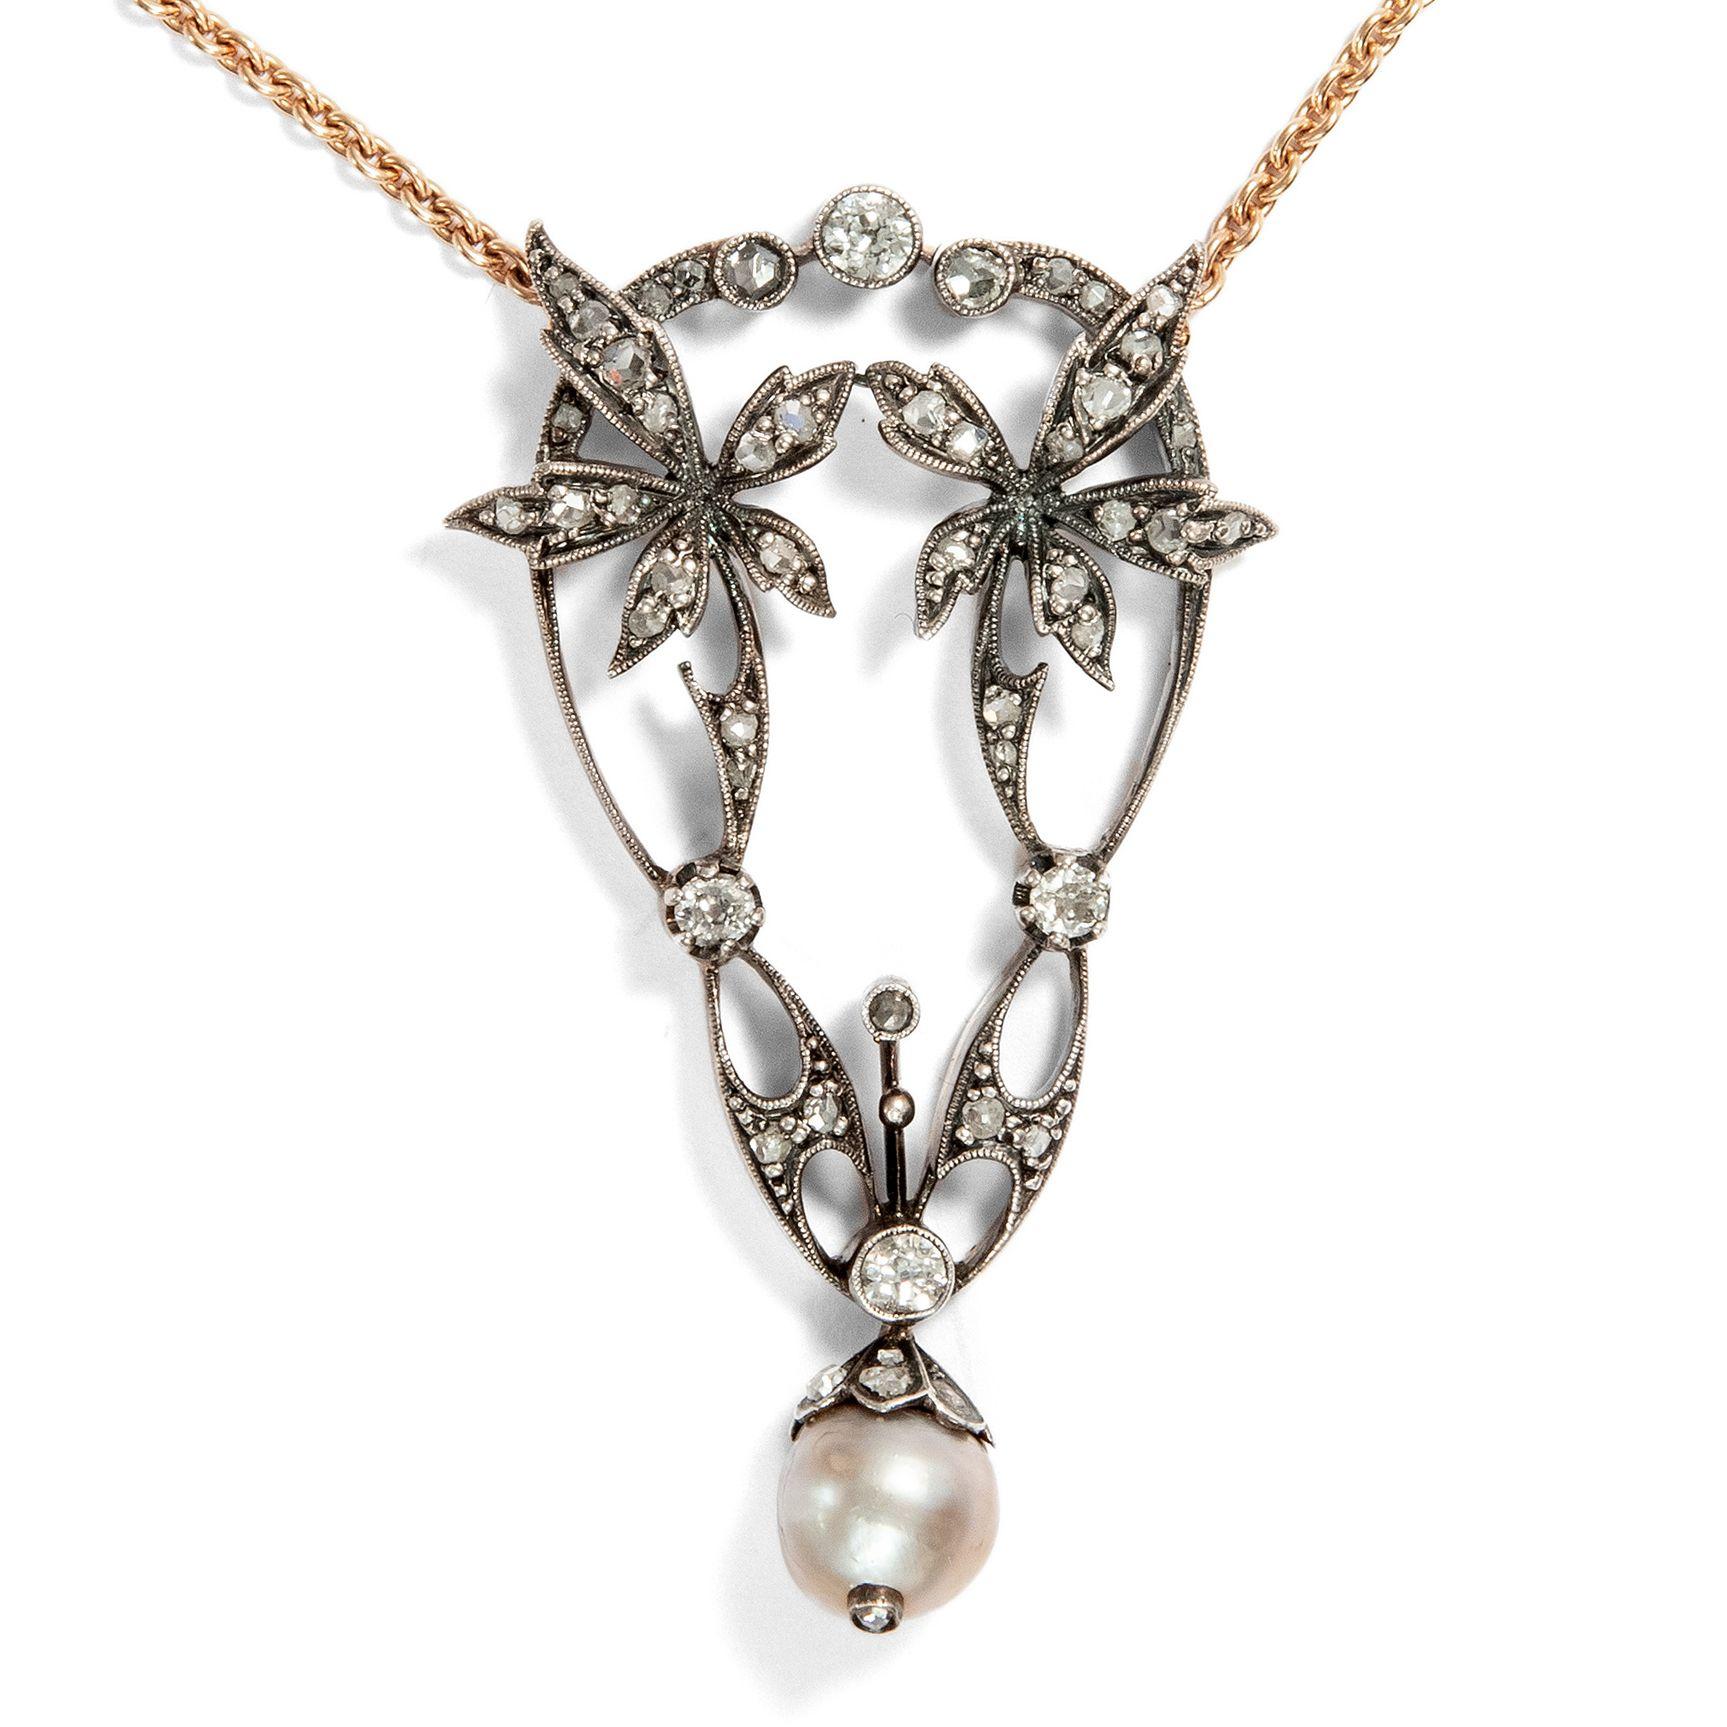 Pin Auf Art Nouveau Jewellery Antiker Jugendstil Schmuck